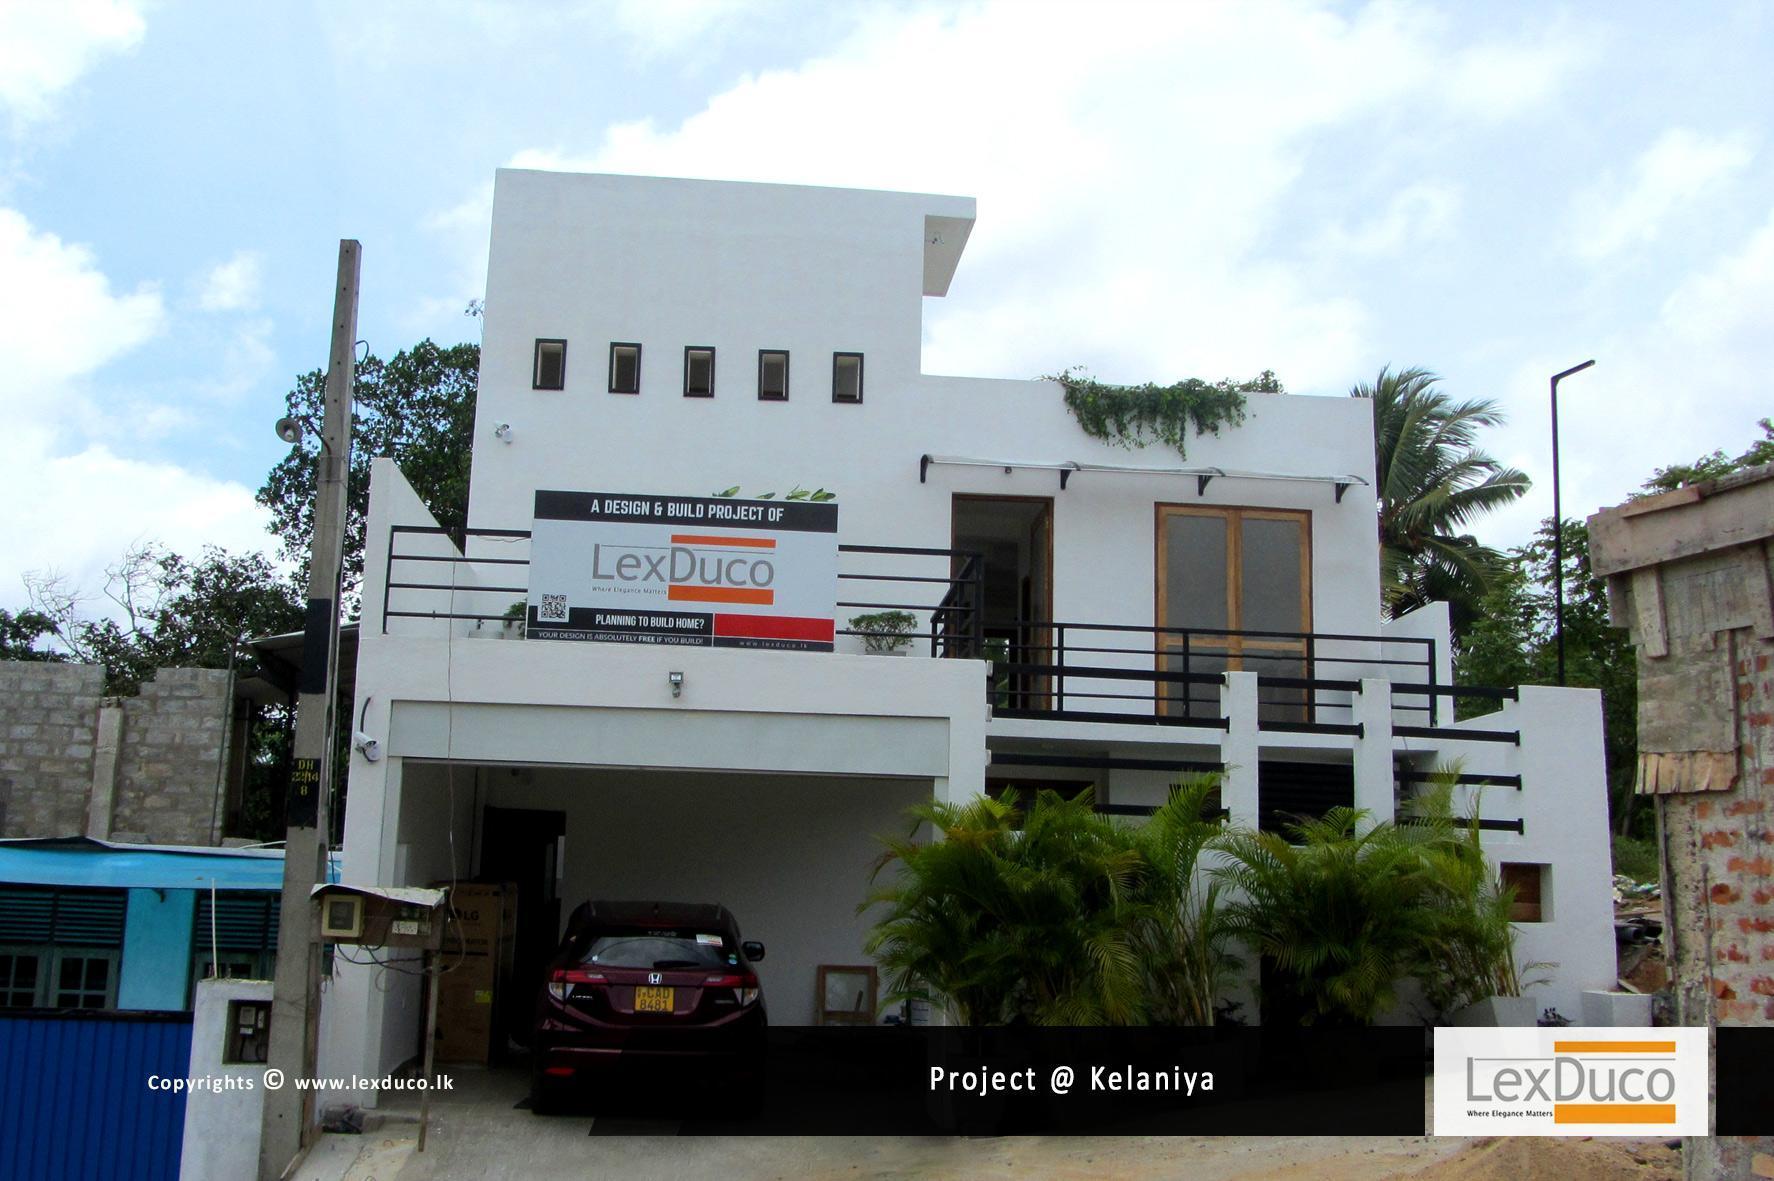 Residential Housing Project at Kelaniya | Lex Duco